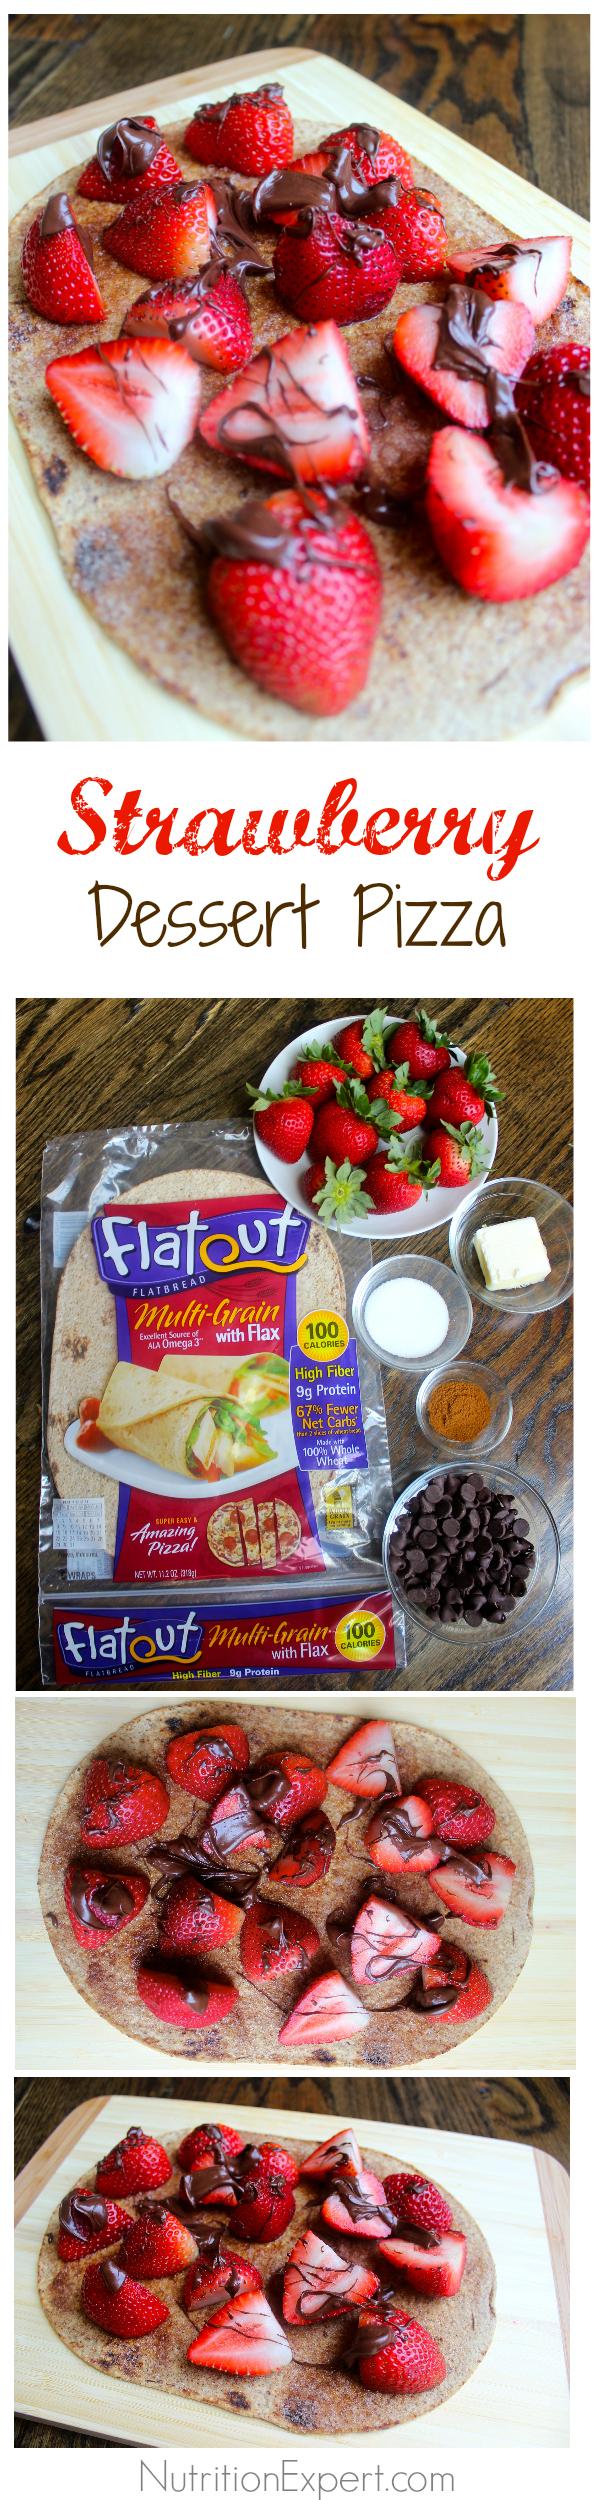 Strawberry Dessert Pizza - Mitzi Dulan, America's ...